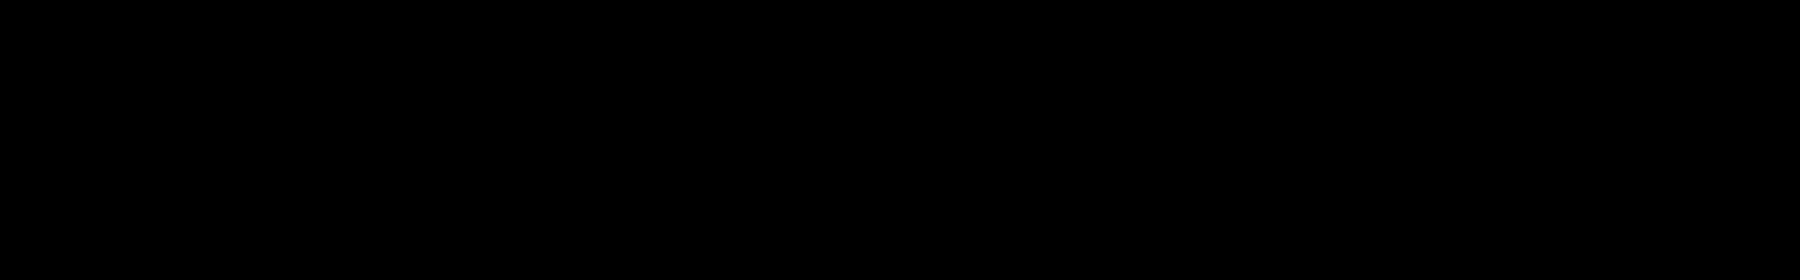 Polo Guitars audio waveform